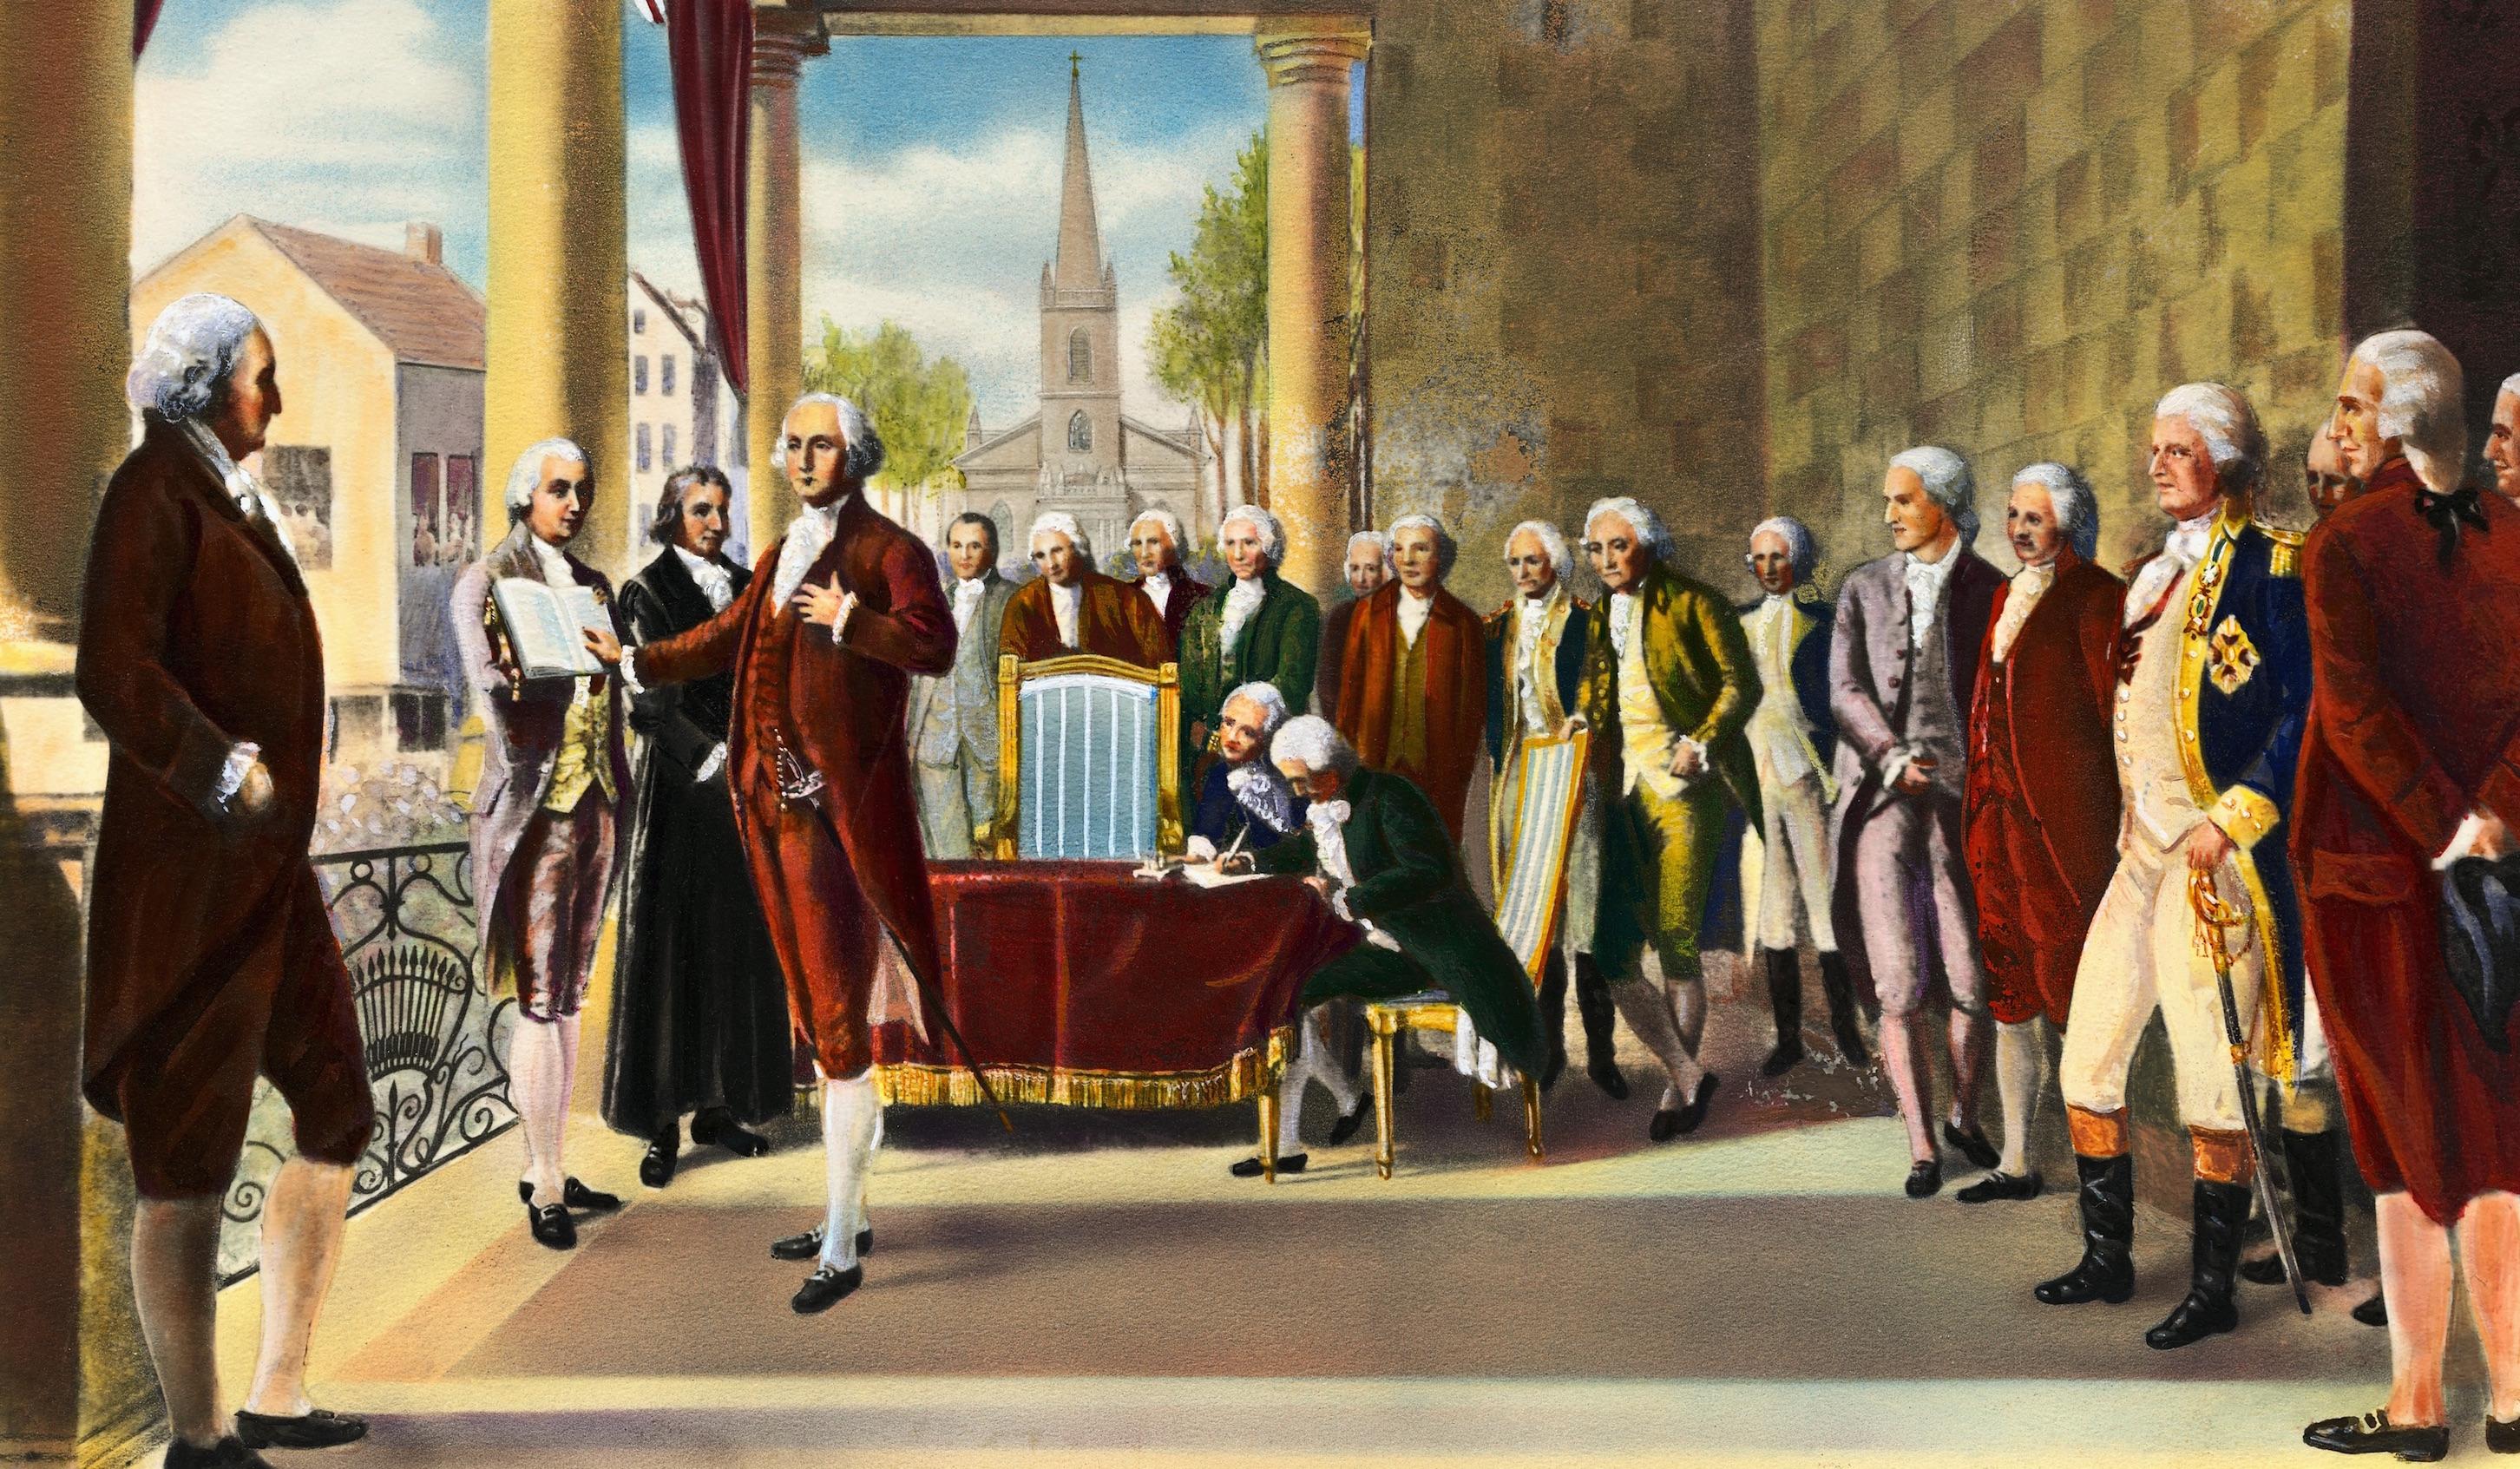 New York City And The Inauguration Of George Washington